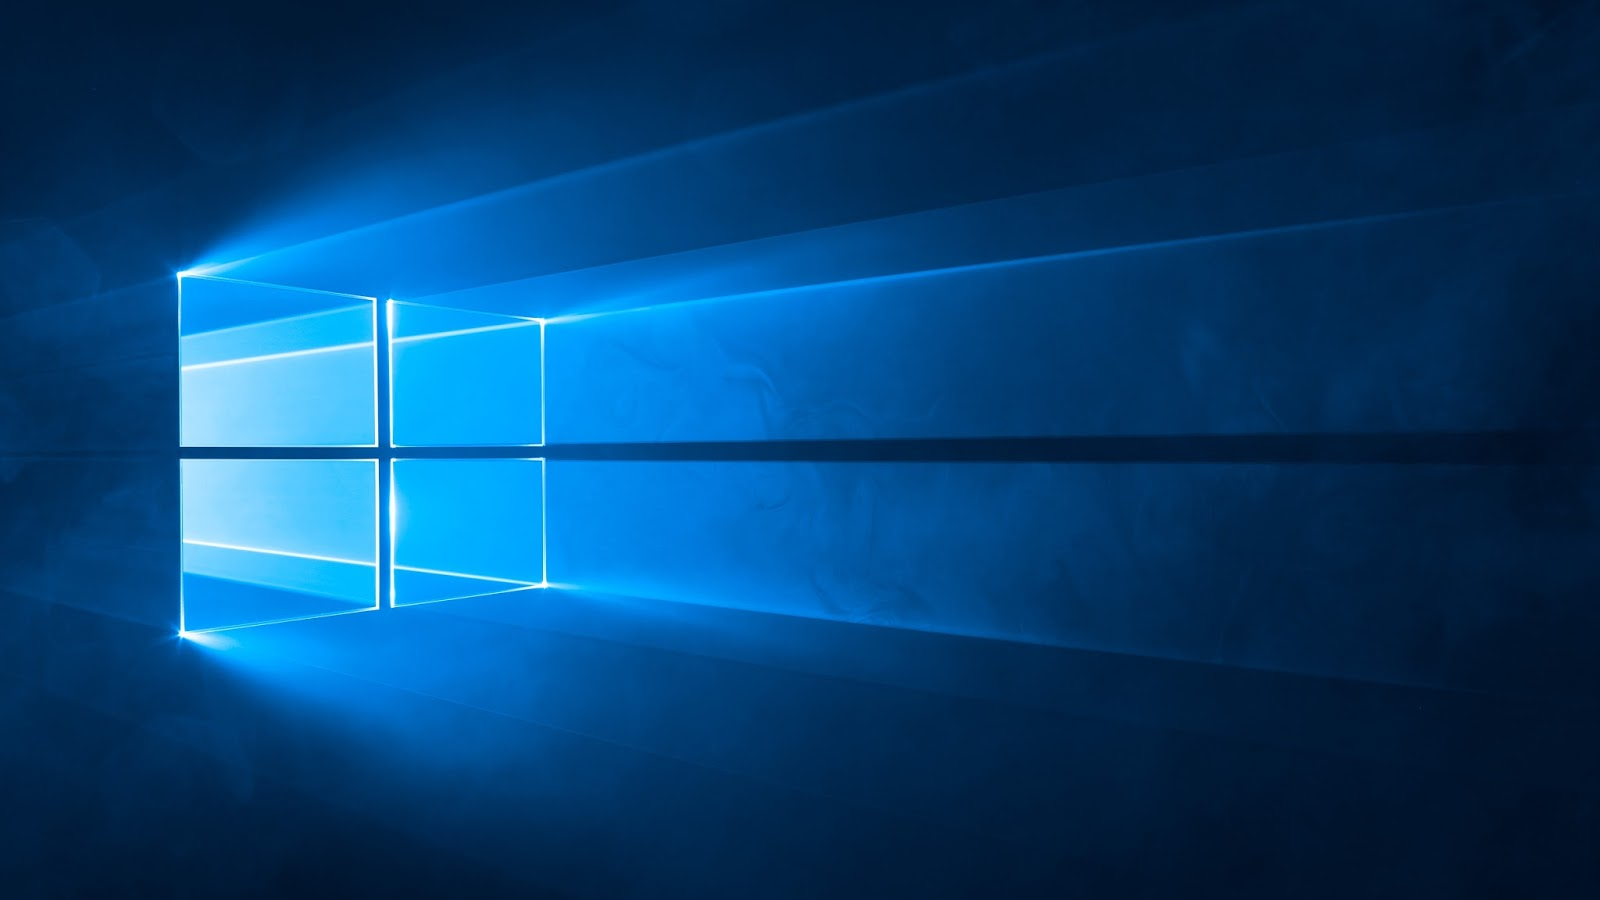 Free Download Wallpapers Calendars Microsoft Windows 10